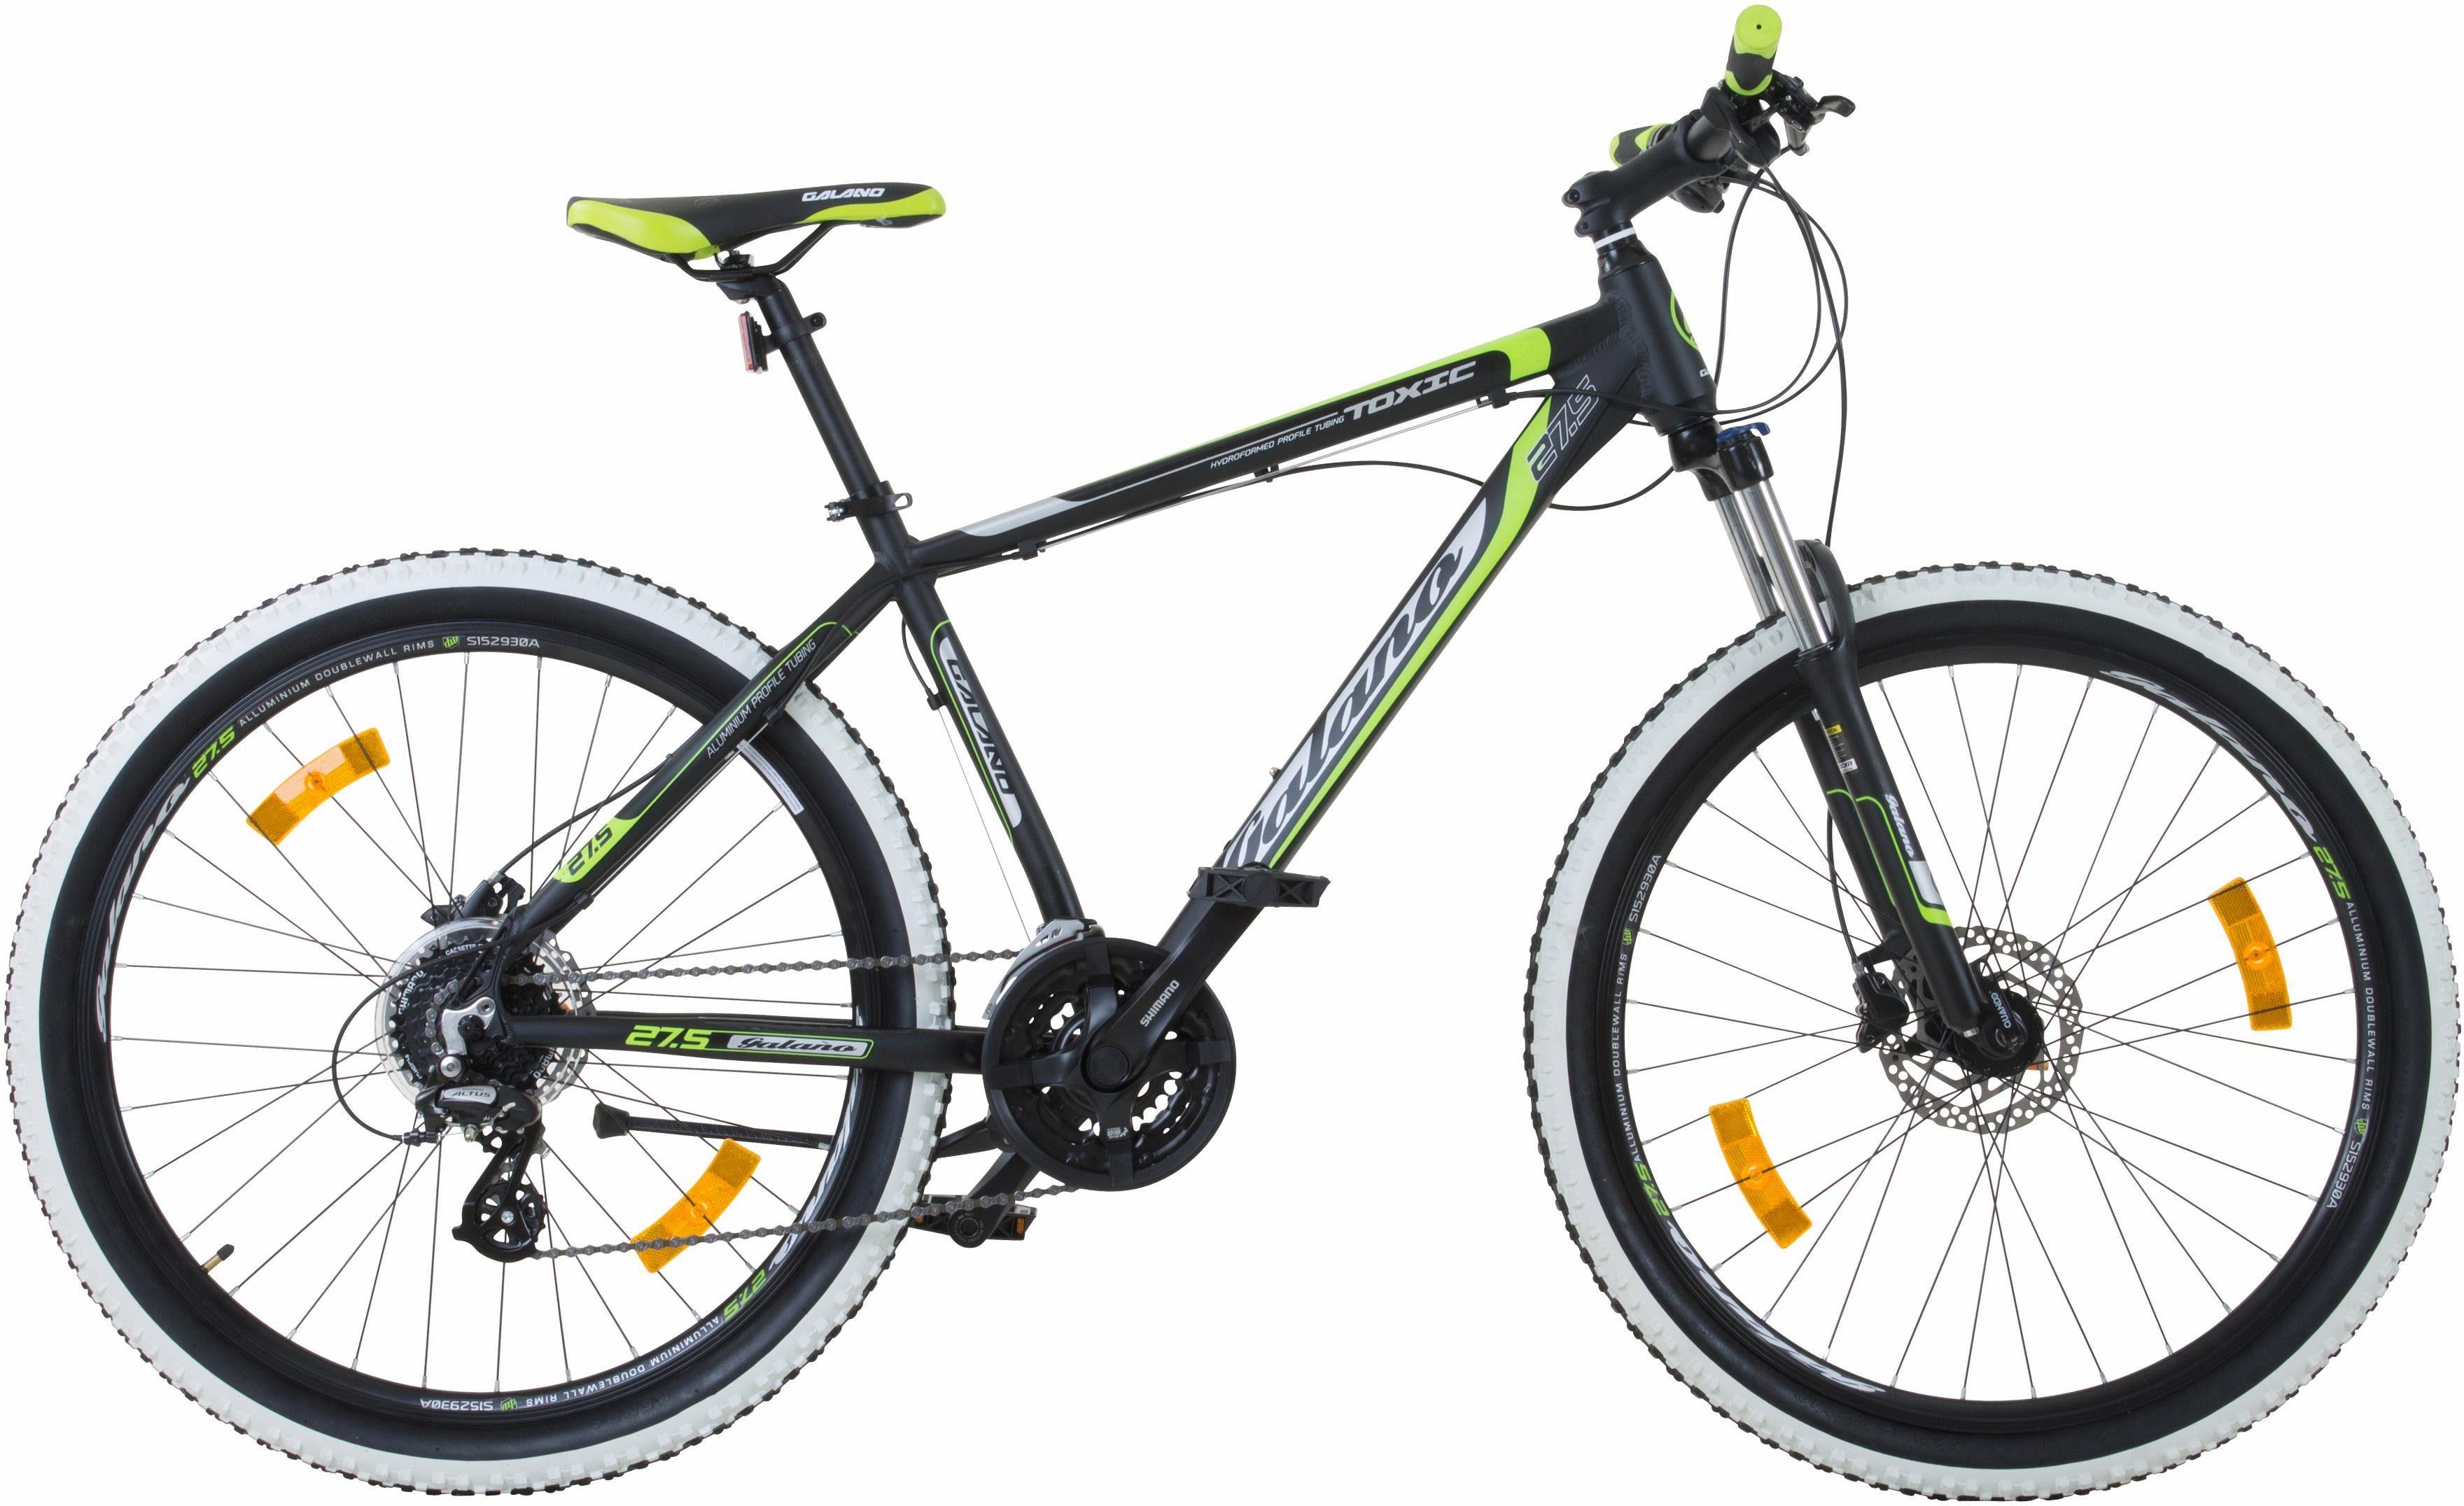 Galano Mountainbike »Toxic«, 24 Gang Shimano Altus M310 Schaltwerk, Kettenschaltung